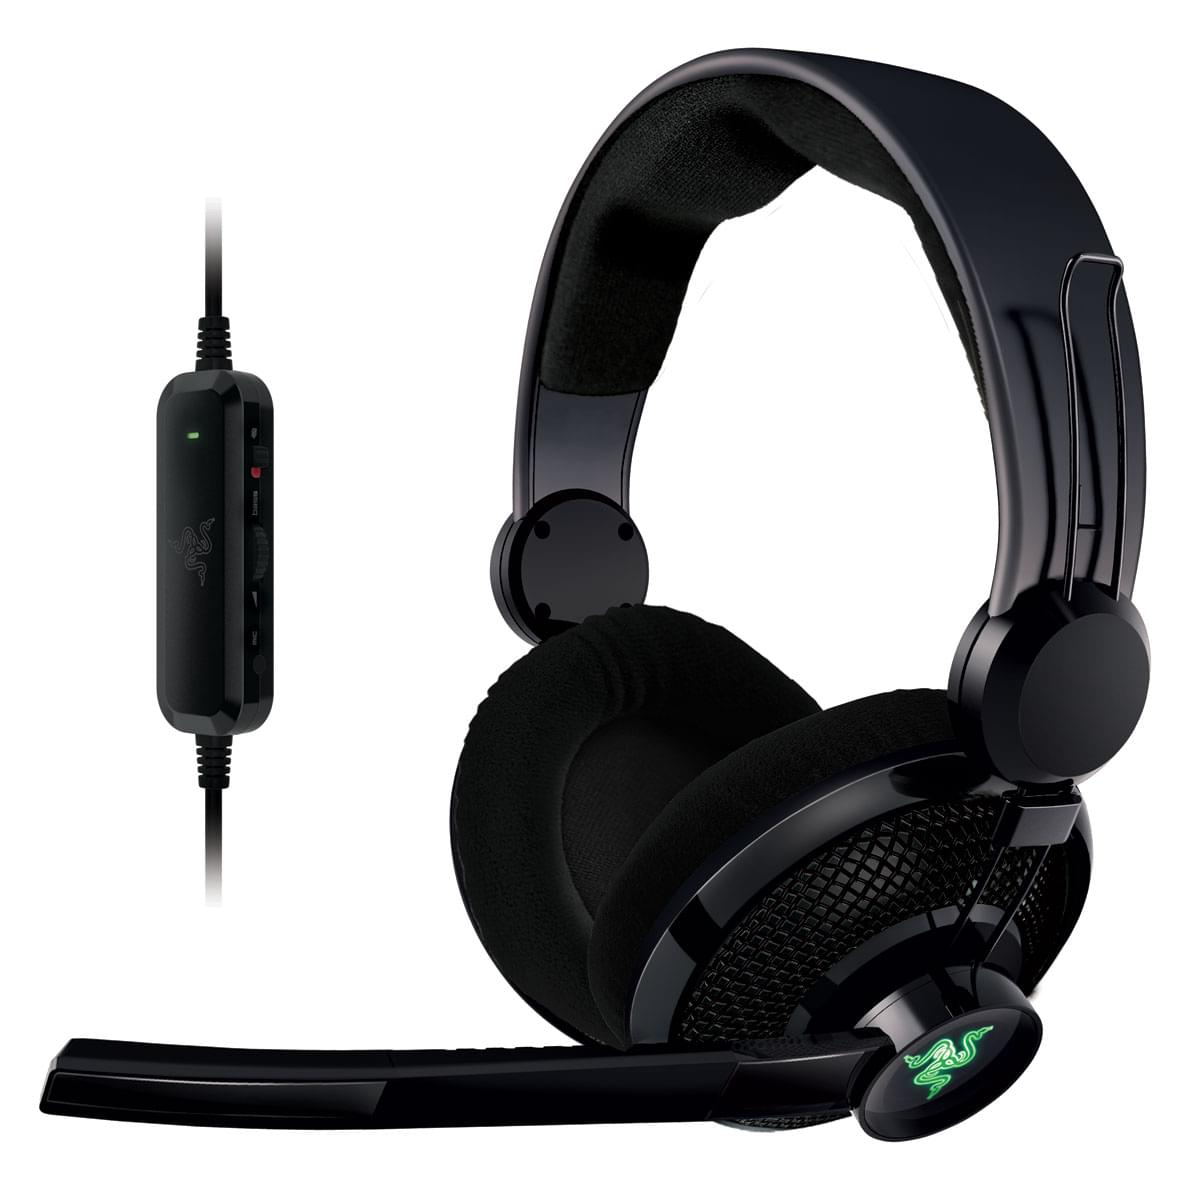 Razer Carcharias XBOX 360/PC (RZ04-00900100-R3M1) - Achat / Vente Micro-casque sur Cybertek.fr - 0